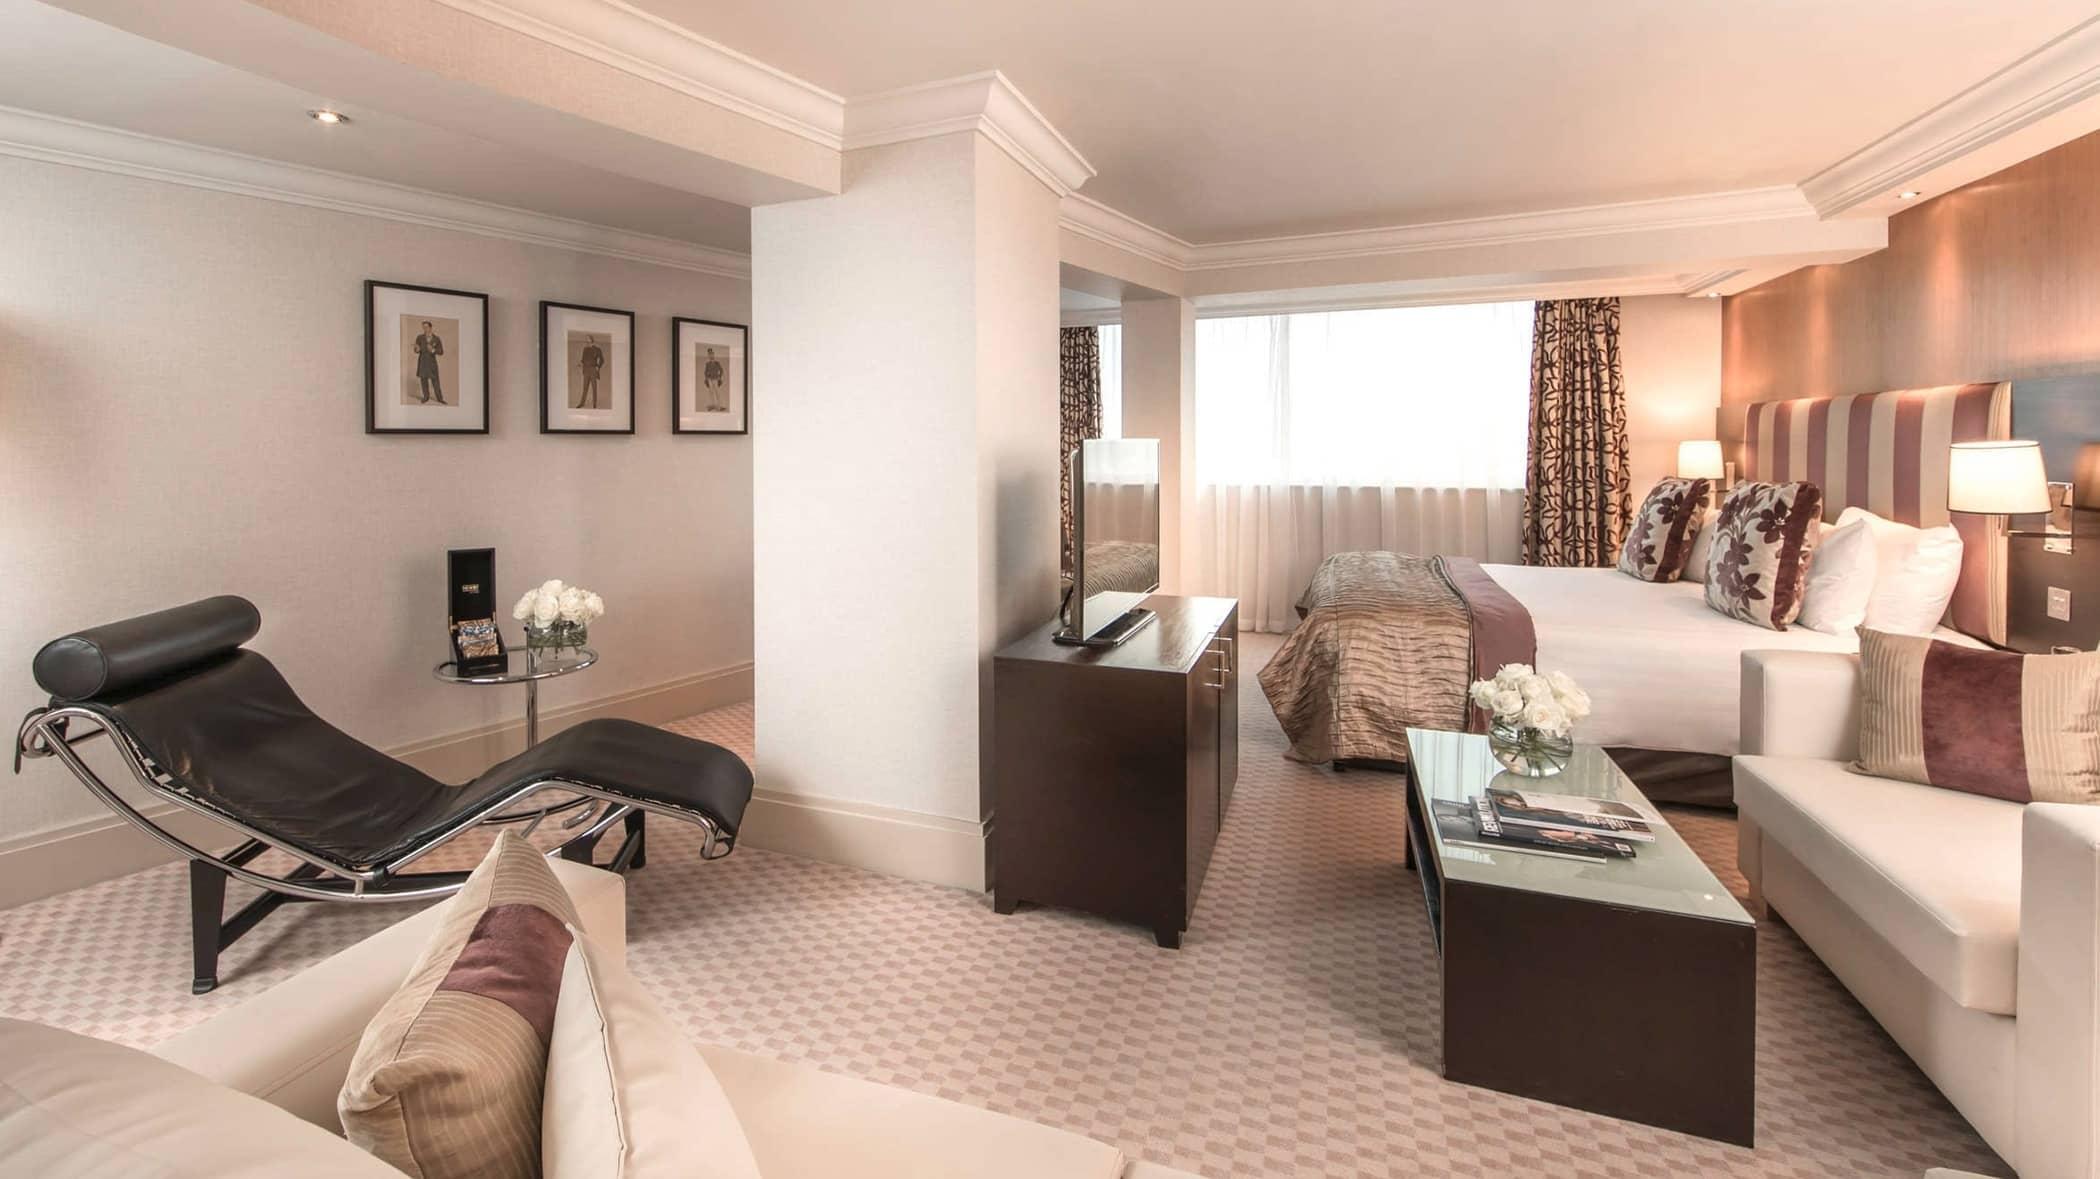 Room in Cavendish Hotel London